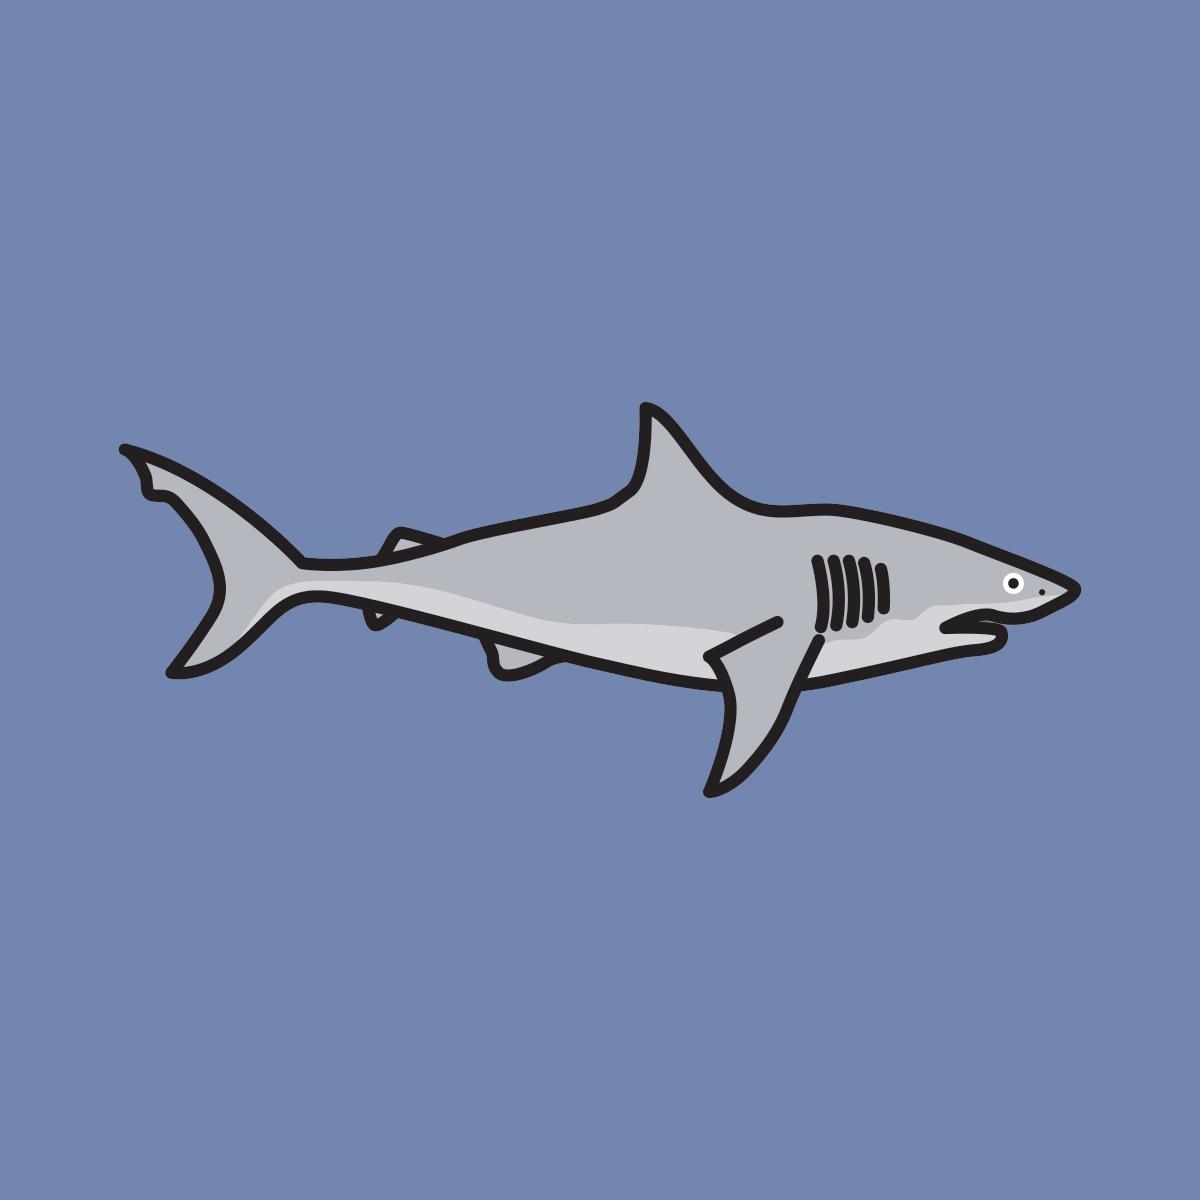 117 sharks